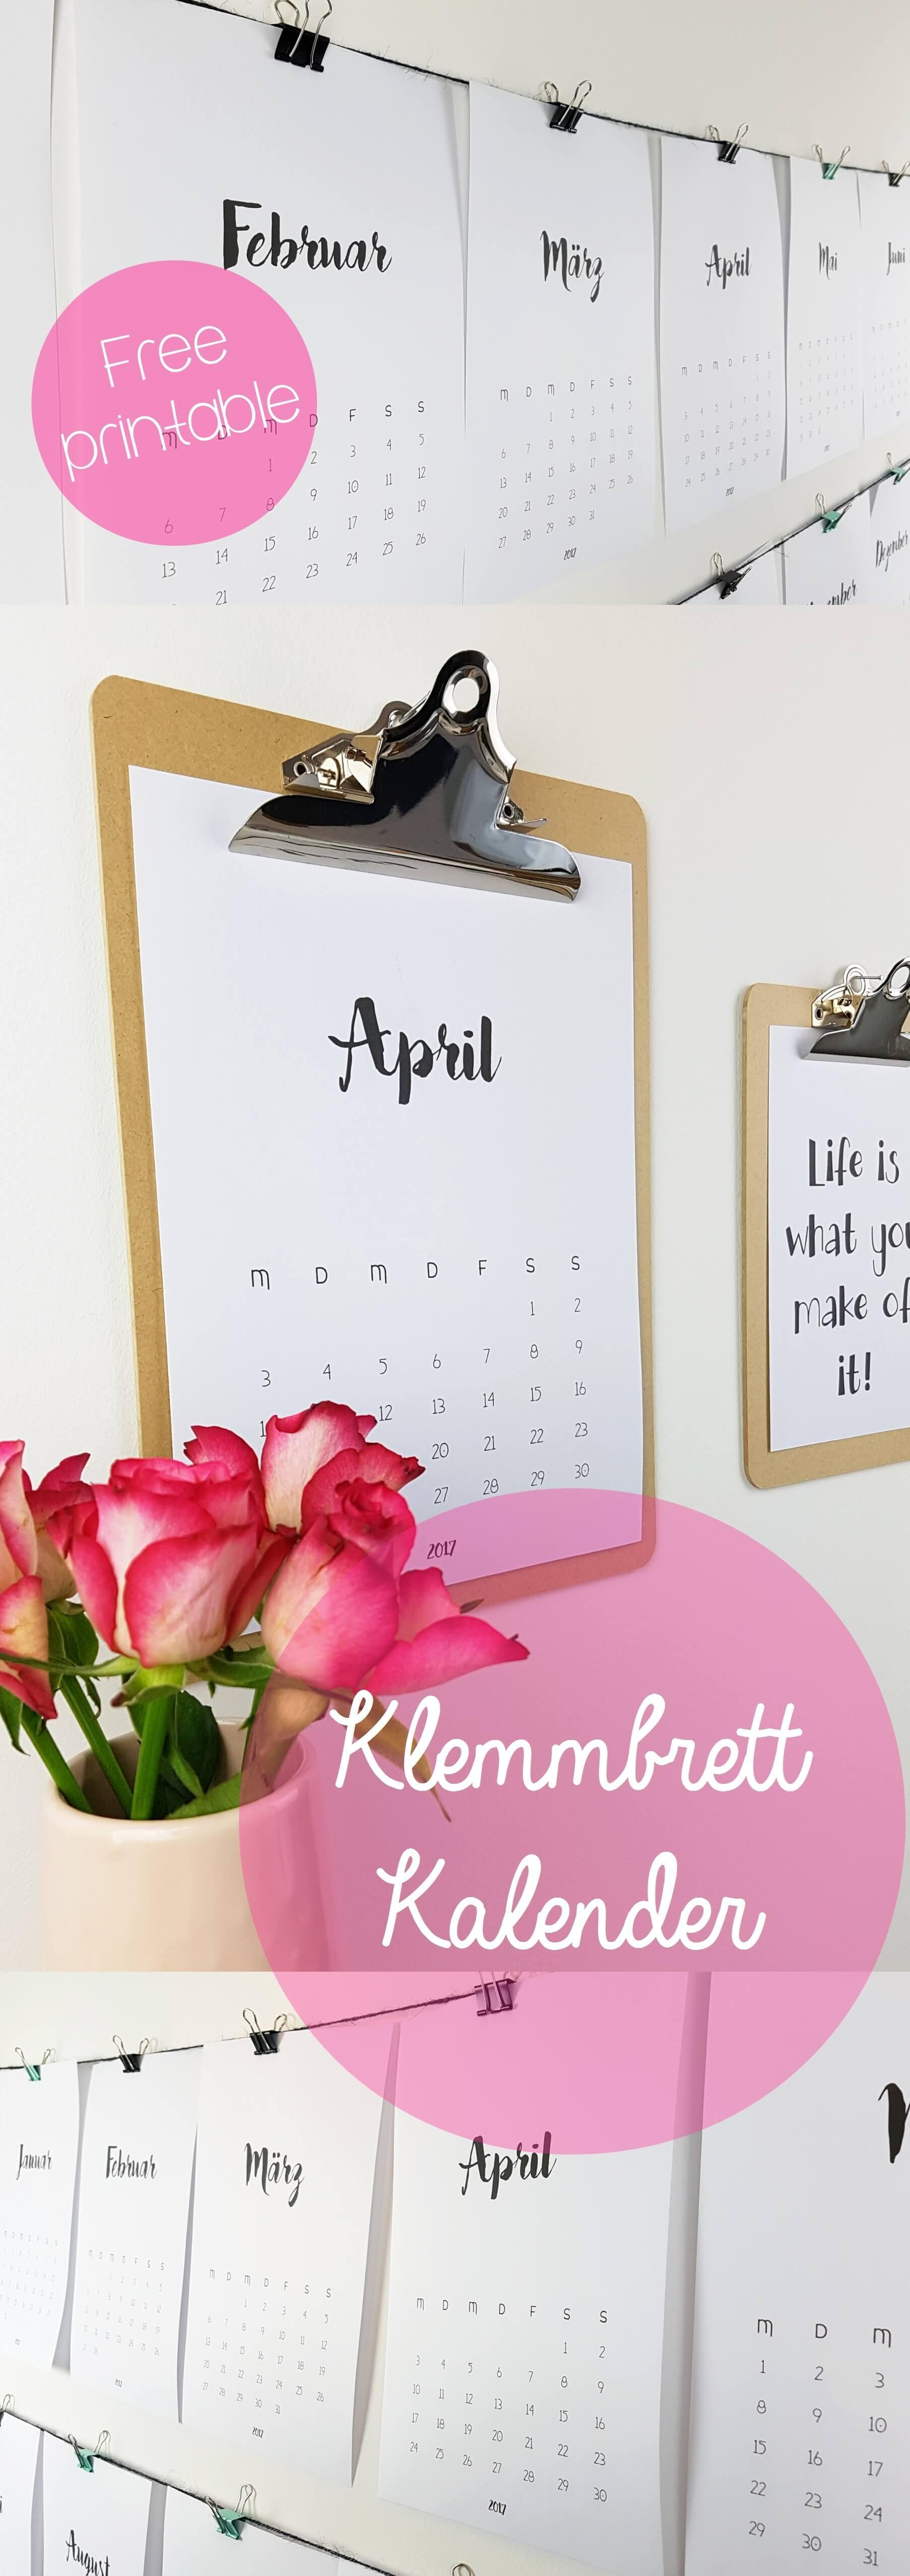 zeitloser-klemmbrett-kalender-diy-free-printable-tantedine